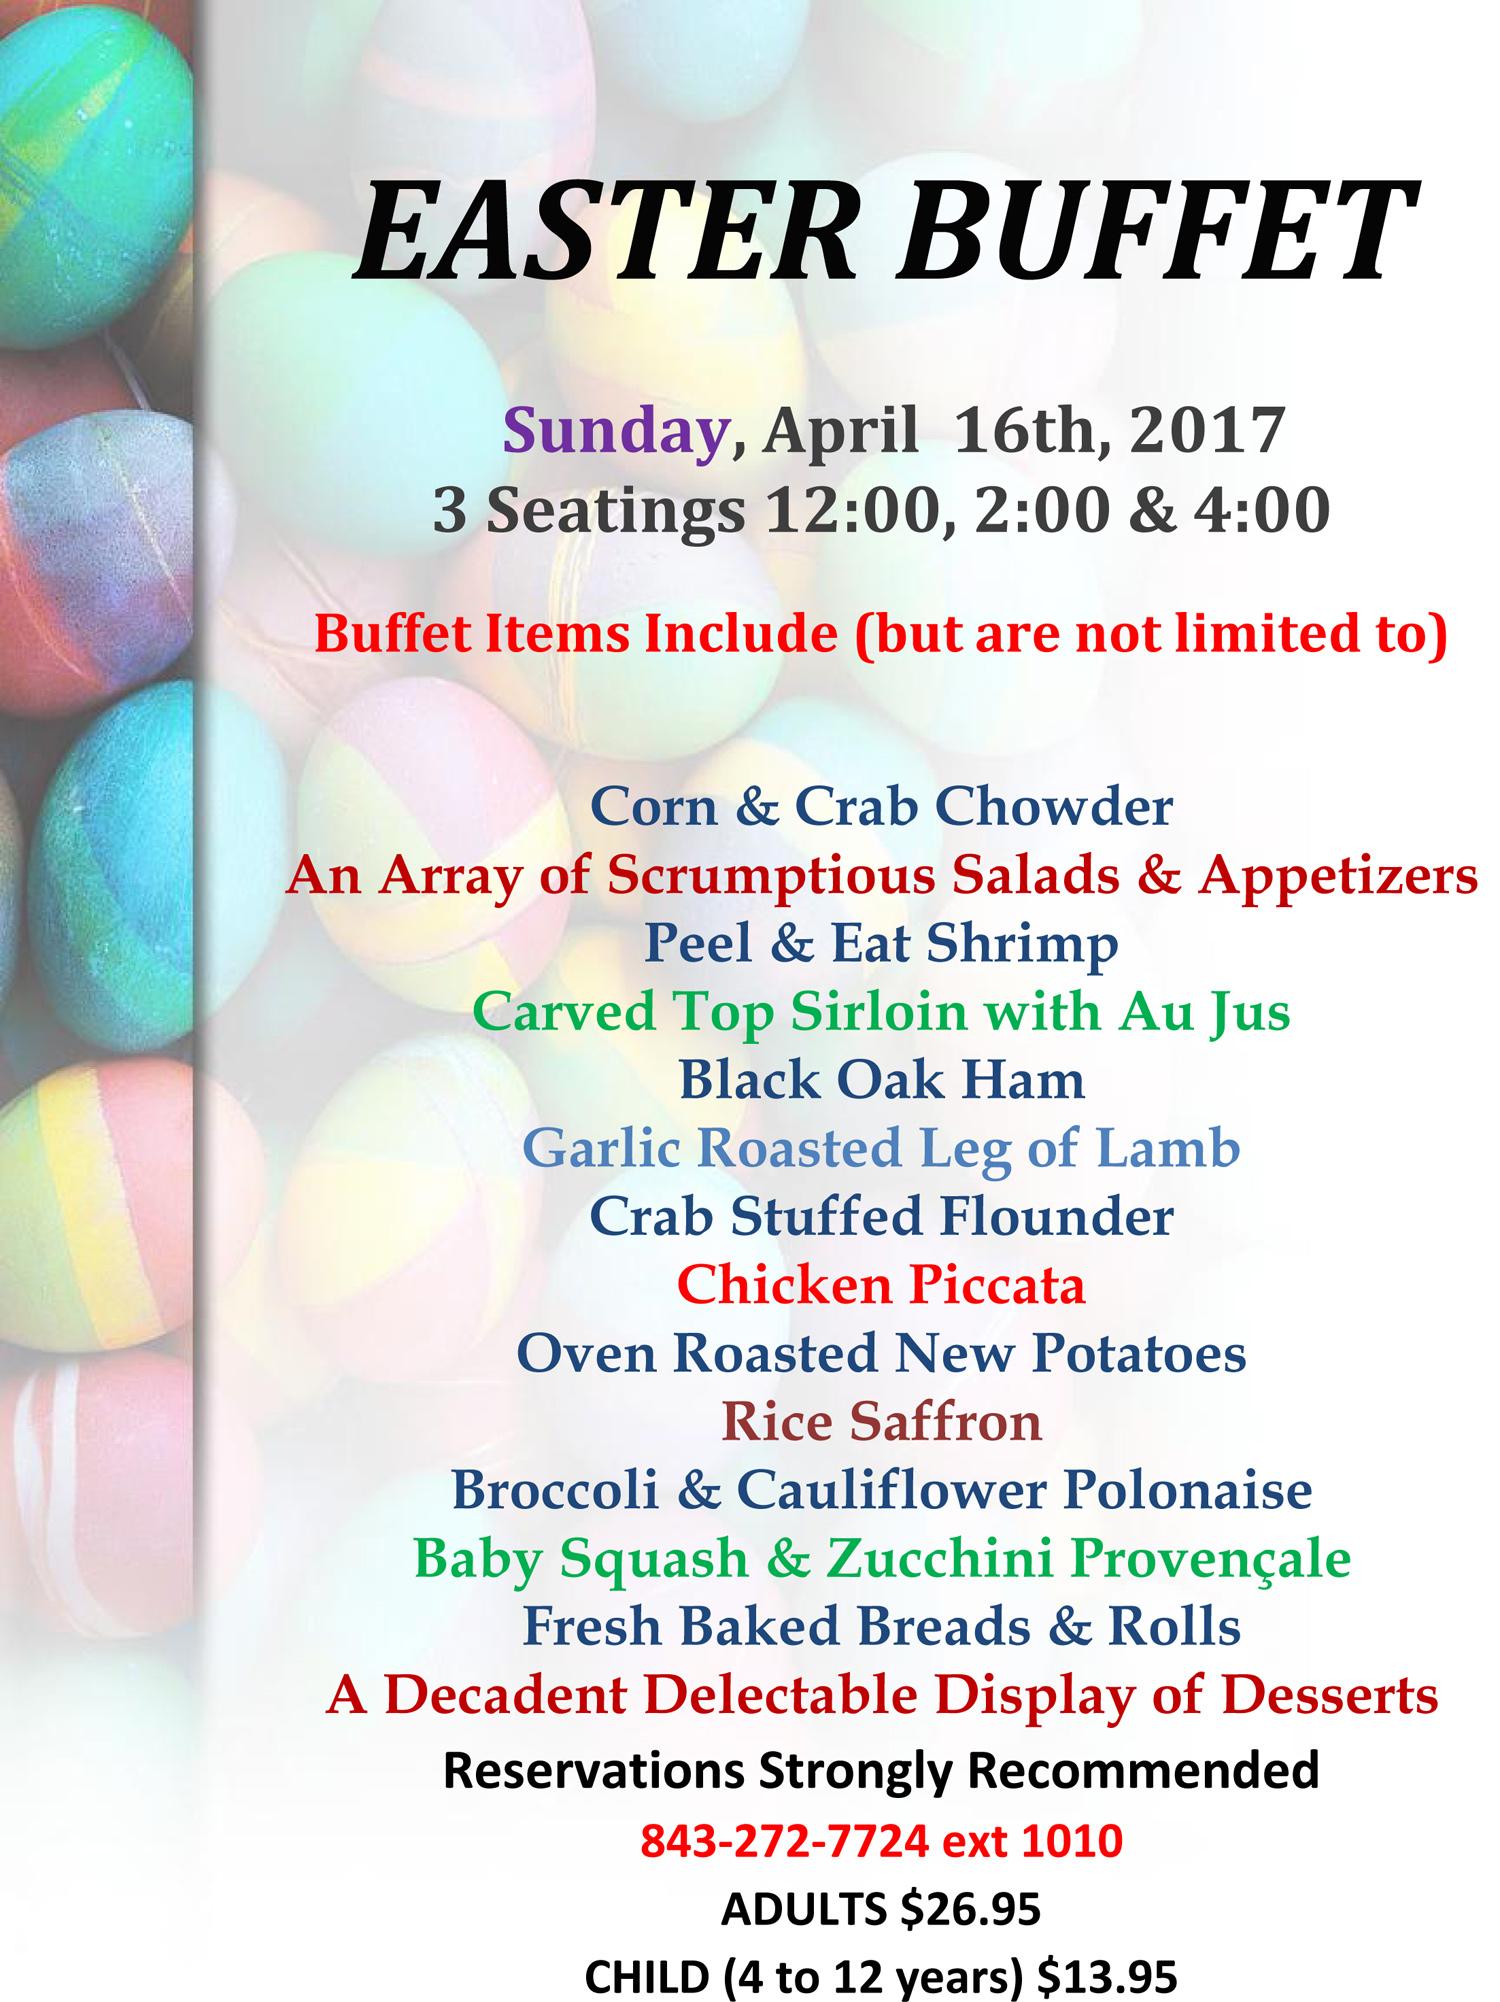 Ocean Creek Resort, near North Myrtle Beach, Easter Brunch menu